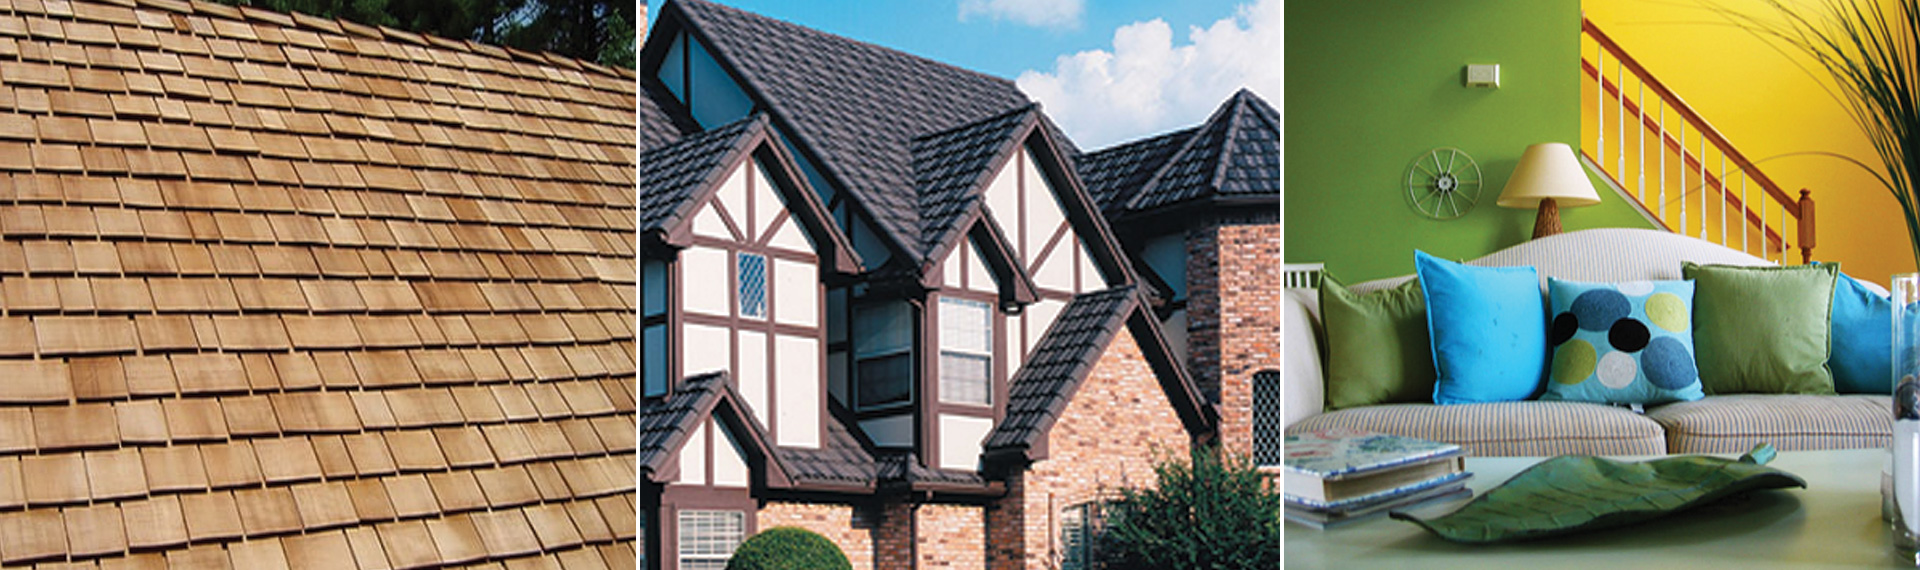 Prodigy Roofing & Construction Missouri City TX